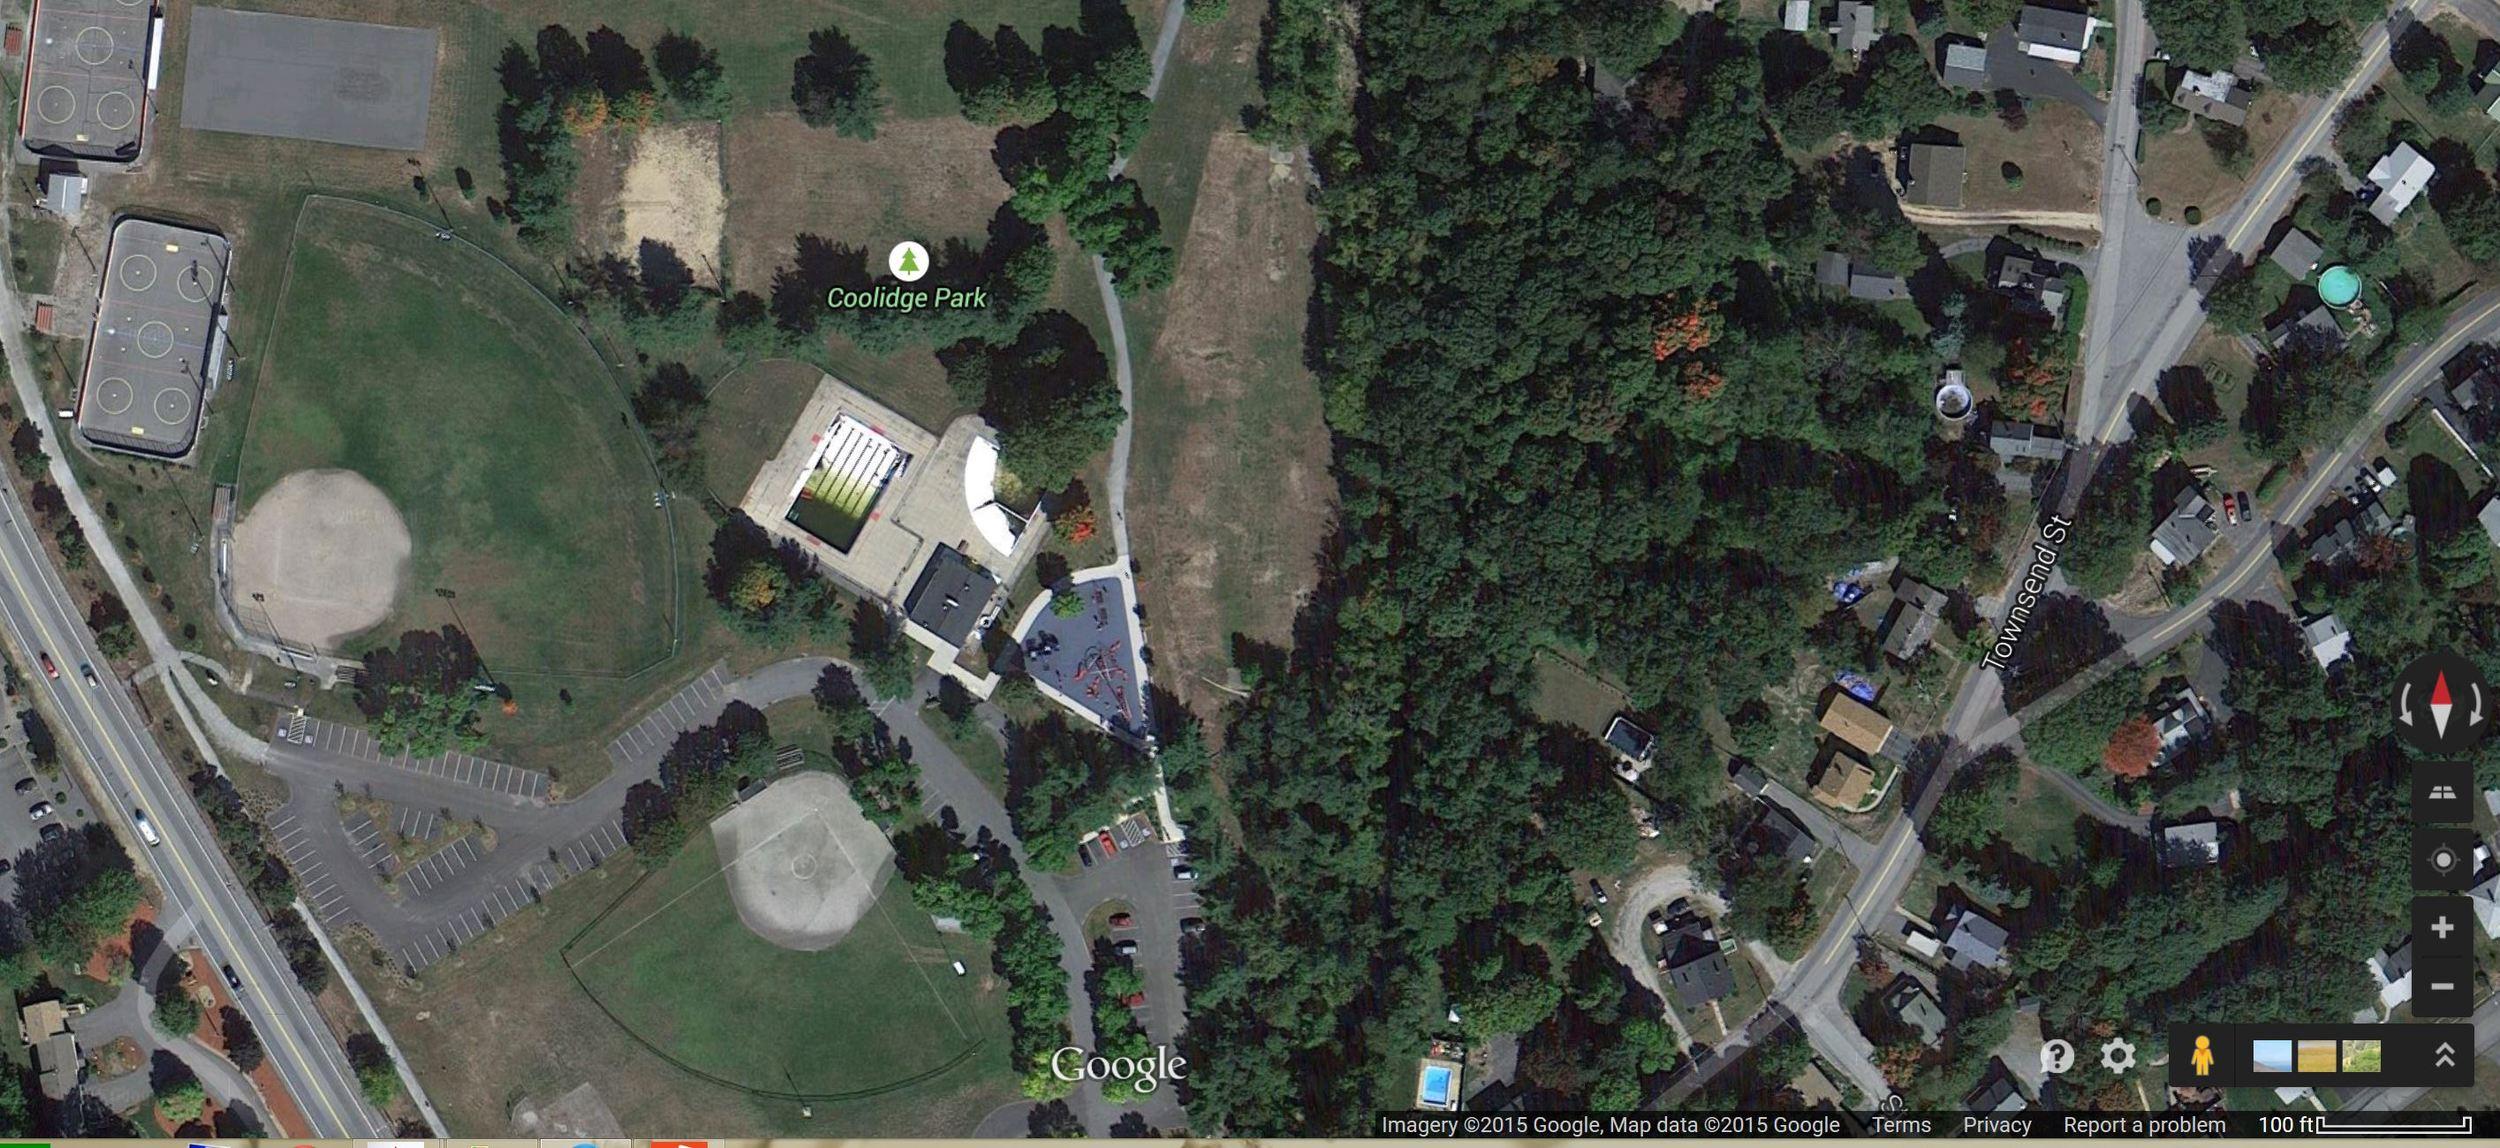 Coolidge Park Google Earth Image 2015